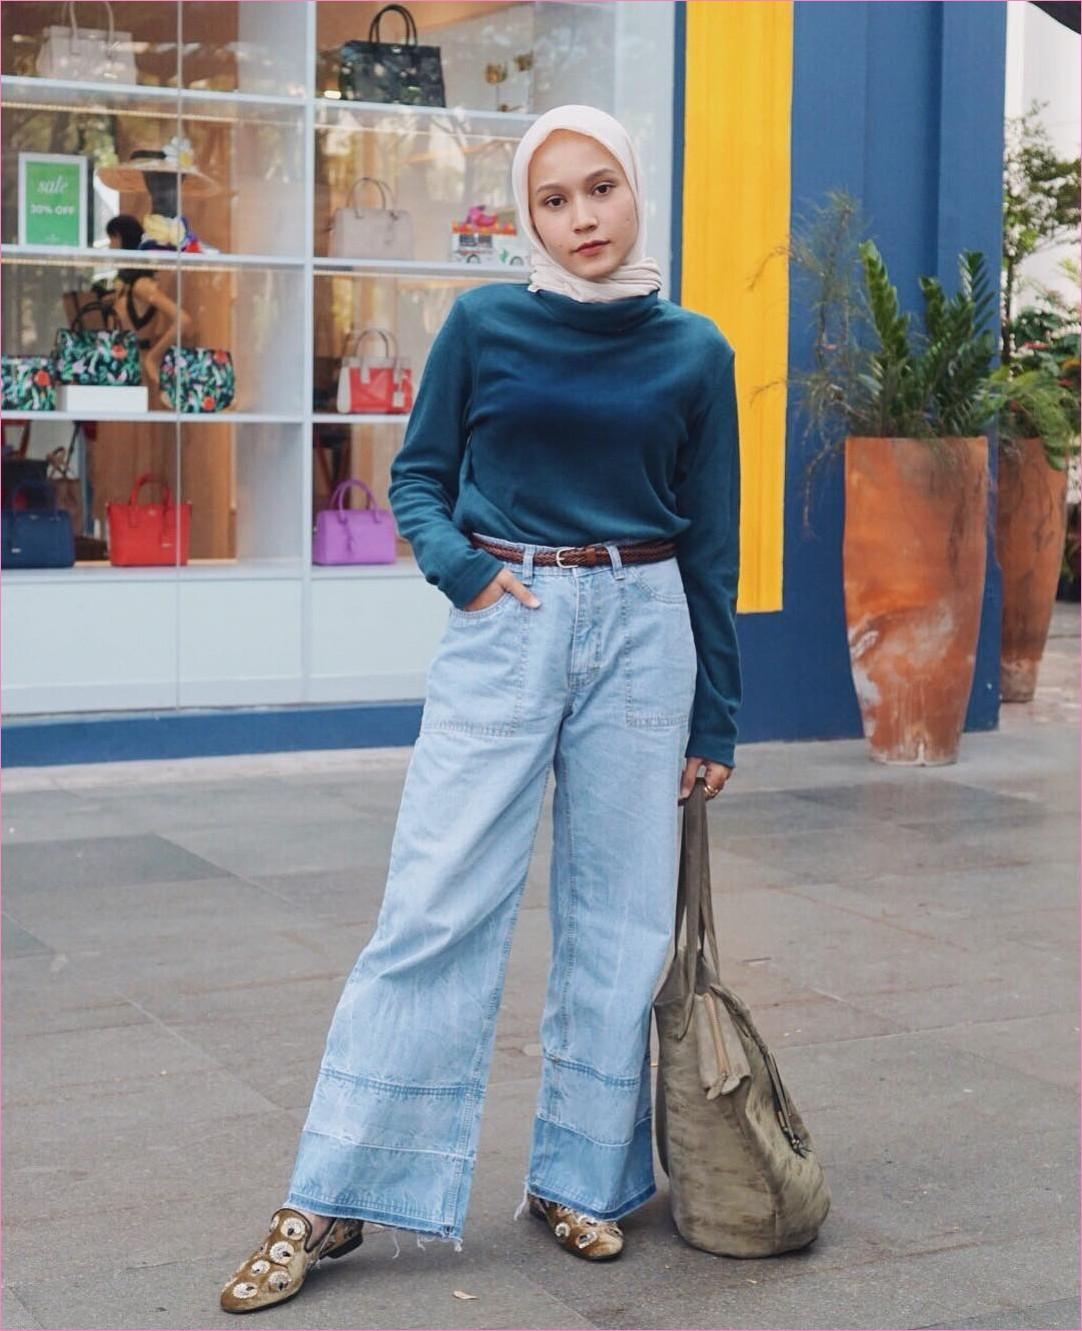 Outfit Celana Jeans Untuk Hijabers Ala Selebgram 2018 mangset t-shirt biru tua bulu totebags hijau tua kerudung segiempat hijab square krem pants jeans denim lace ups loafers and slip ons coklat ikat pinggang ootd trendy